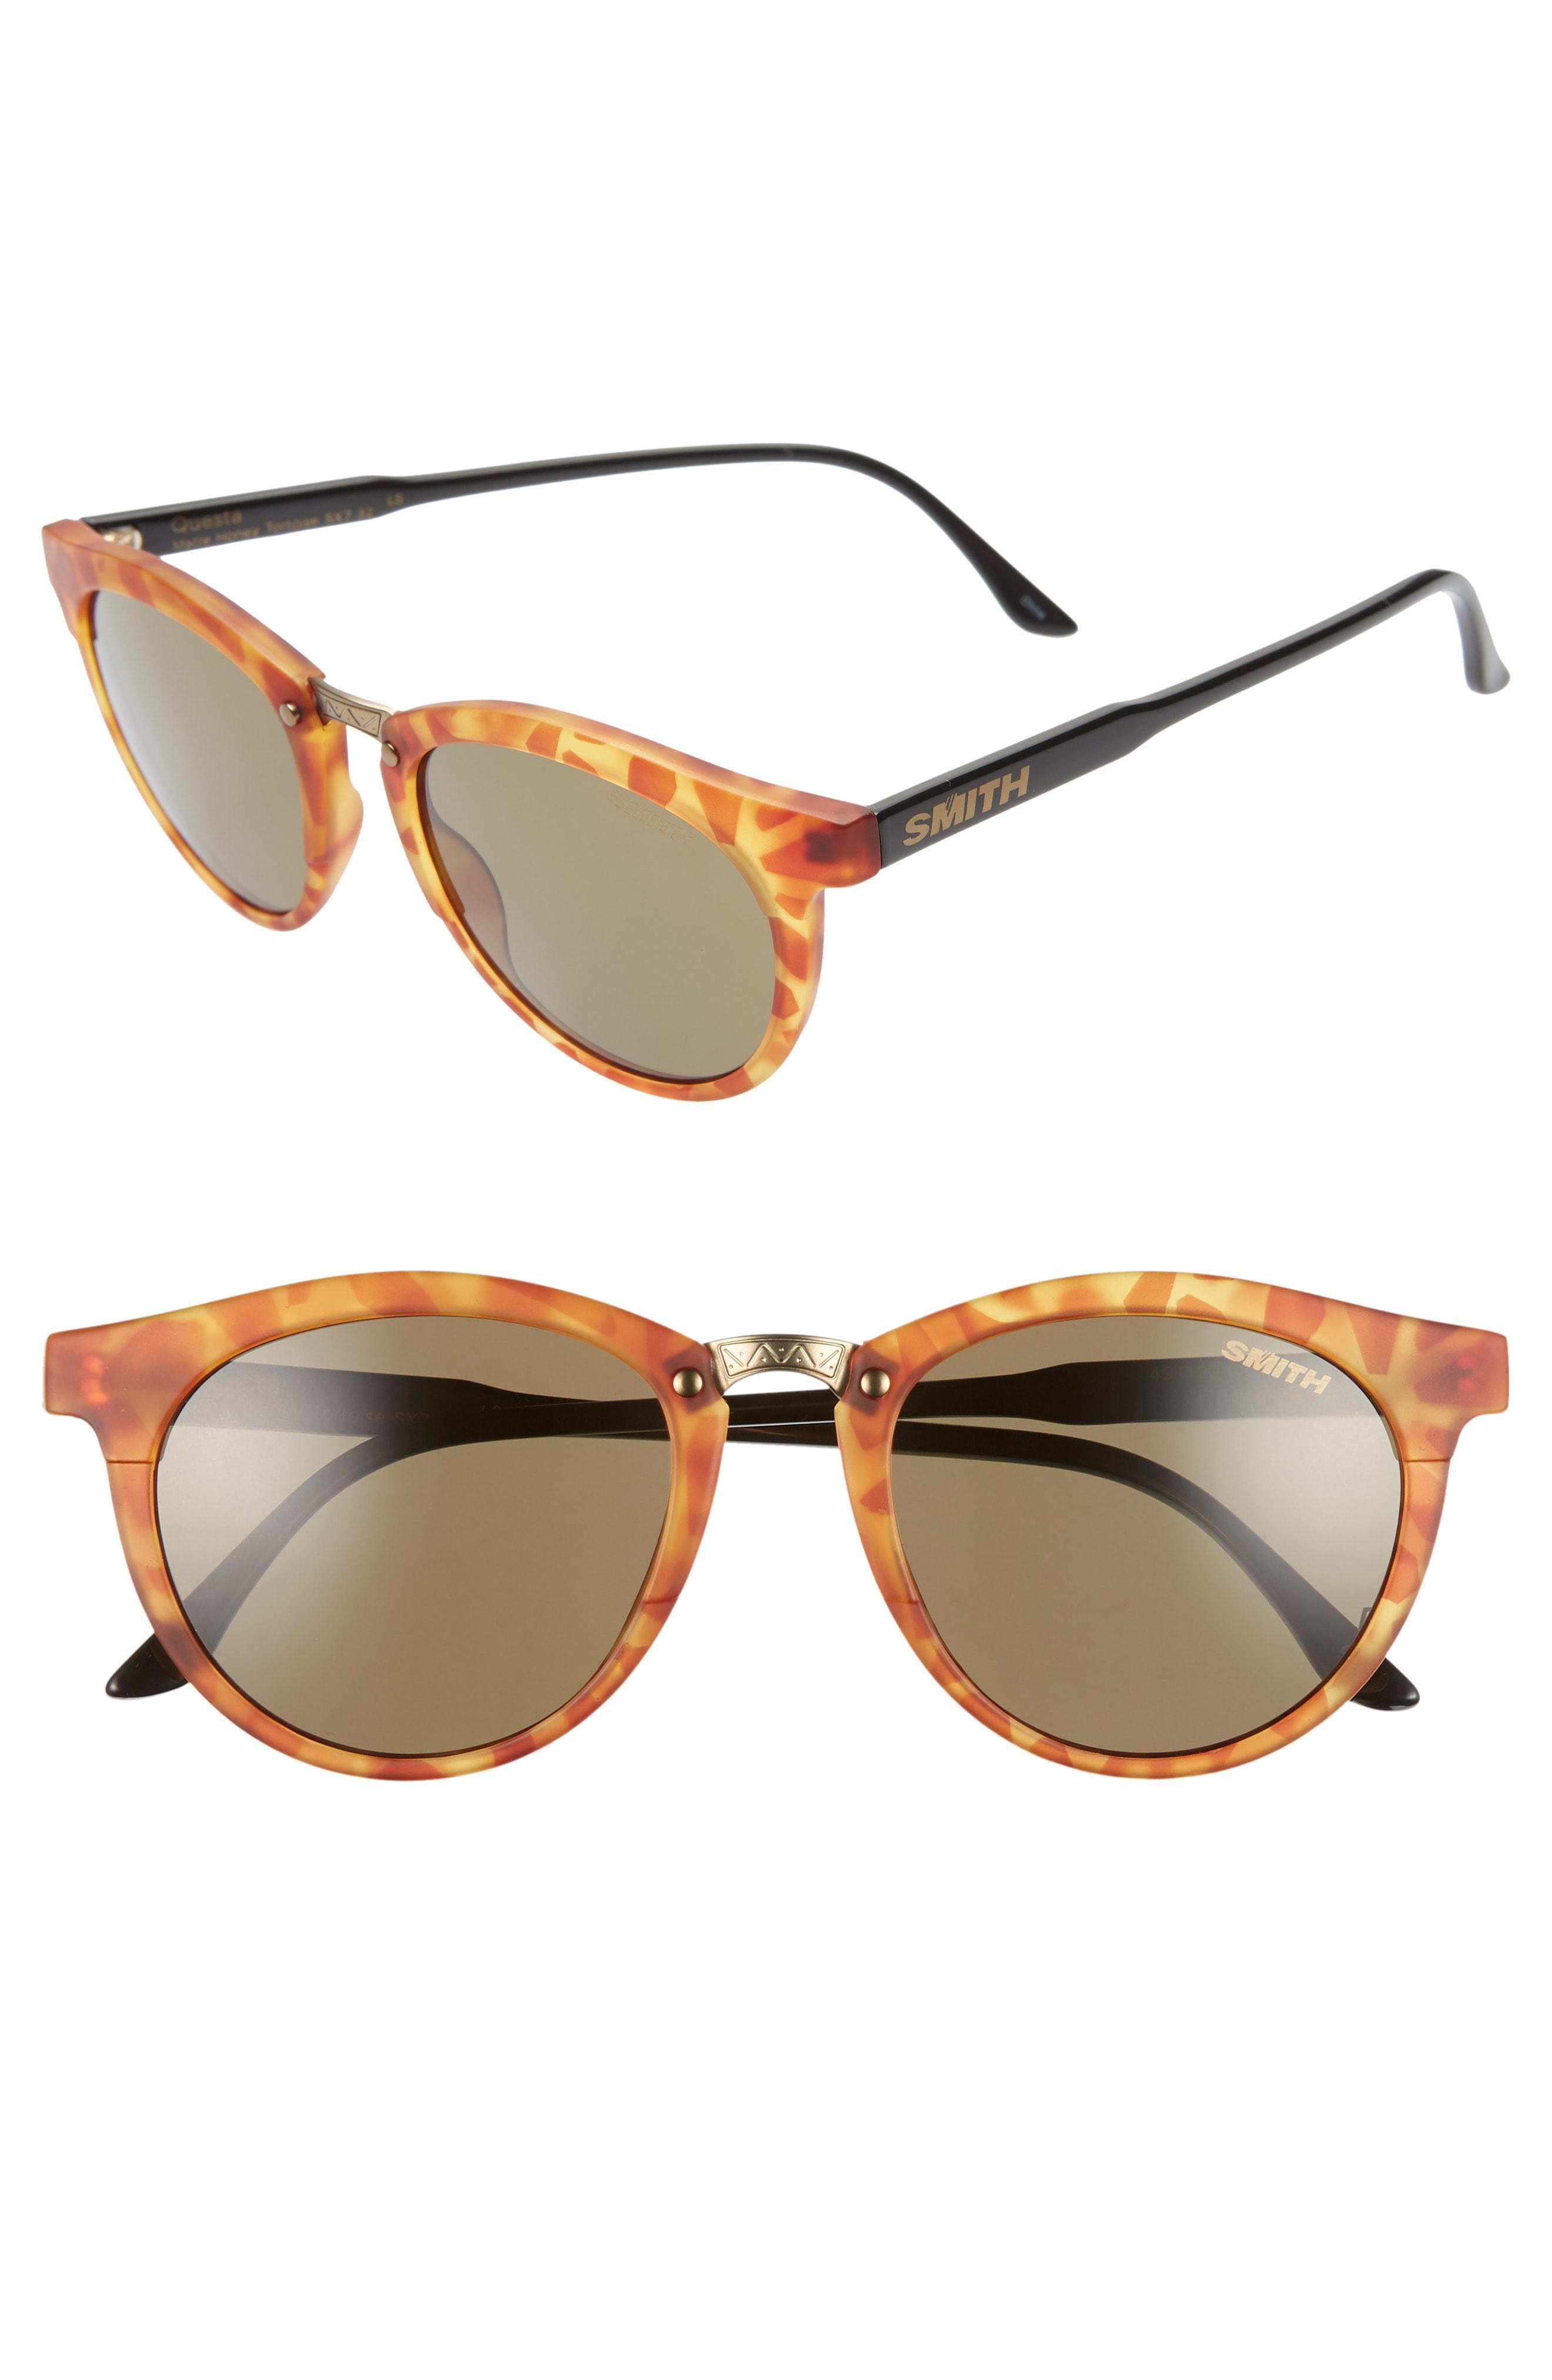 a8c5ae24d4 Smith - Gray Questa 49mm Chromapop Polarized Sunglasses - Honey Tortoise   Grey Green - Lyst. View fullscreen